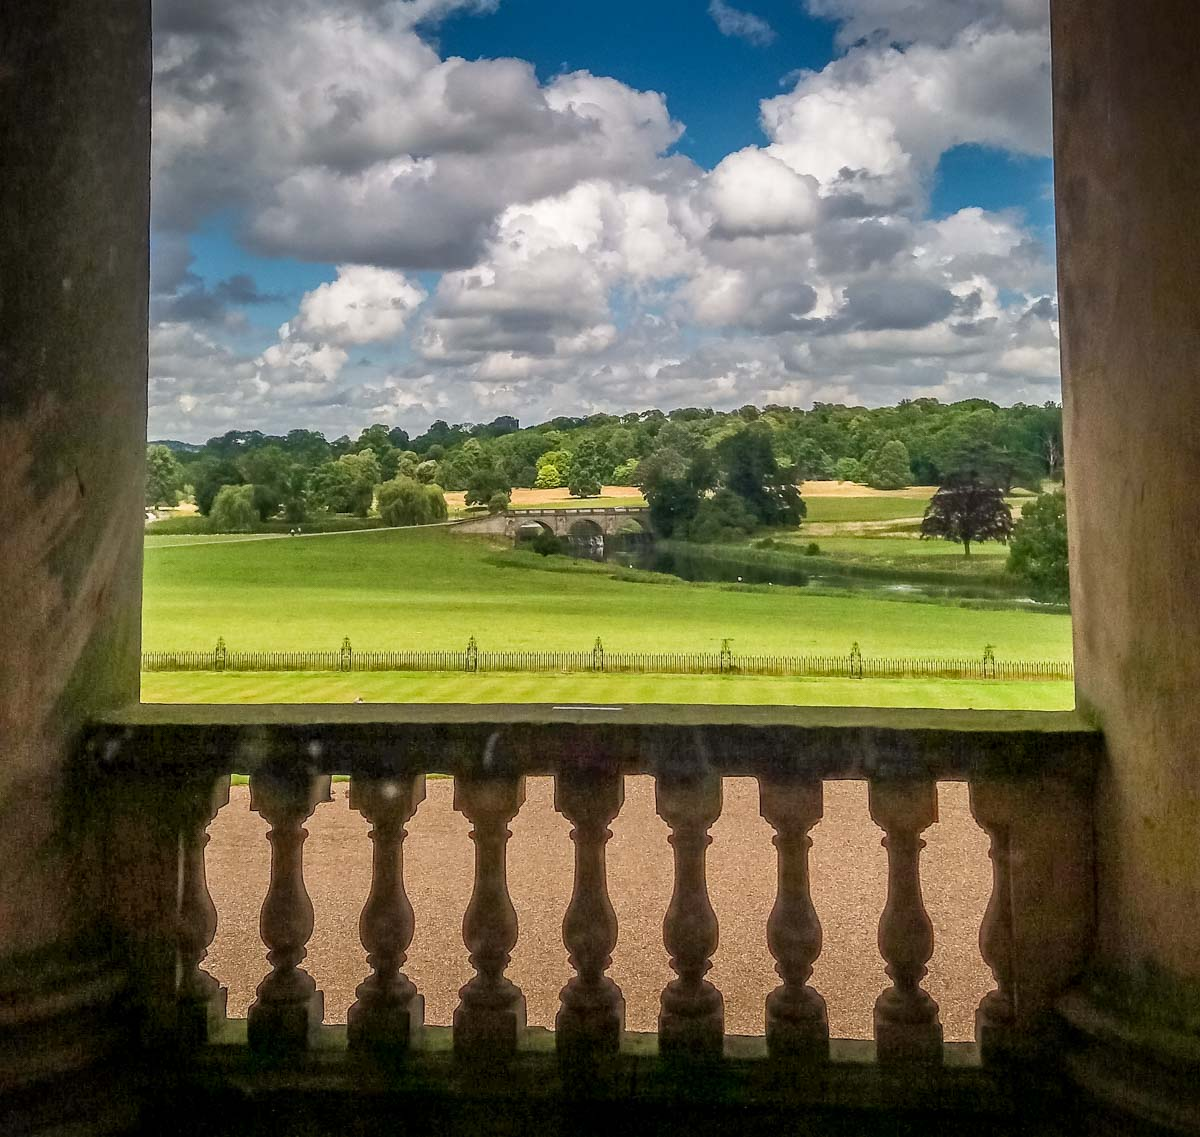 kedleston-5-1 Kedleston Hall – Parkland Walks and Lakeside Views